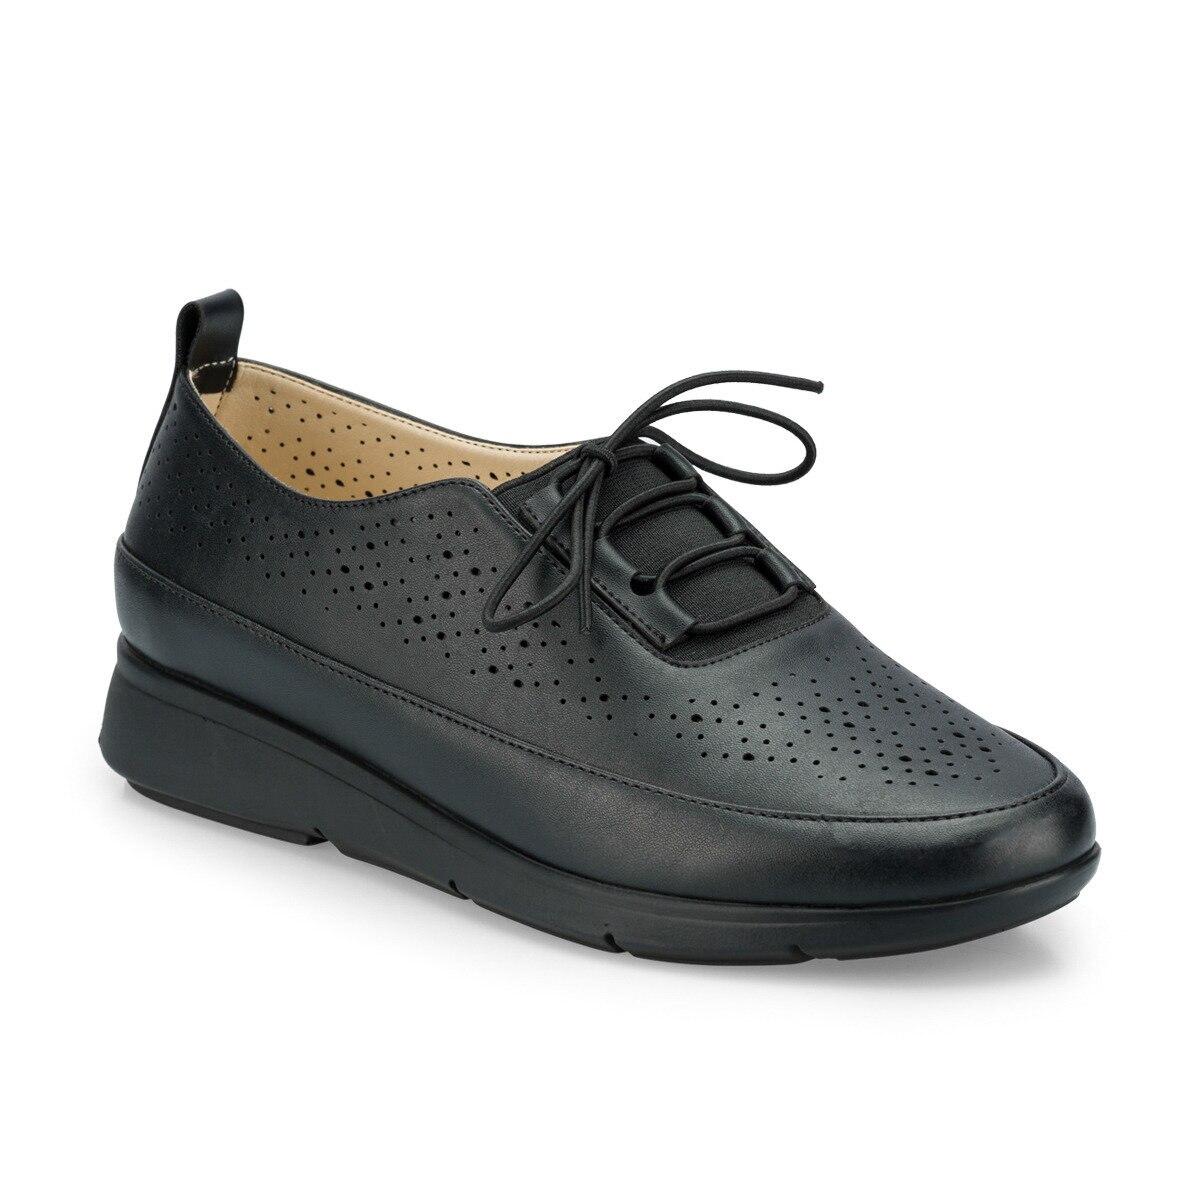 FLO 161009.Z Black Women Shoes Polaris